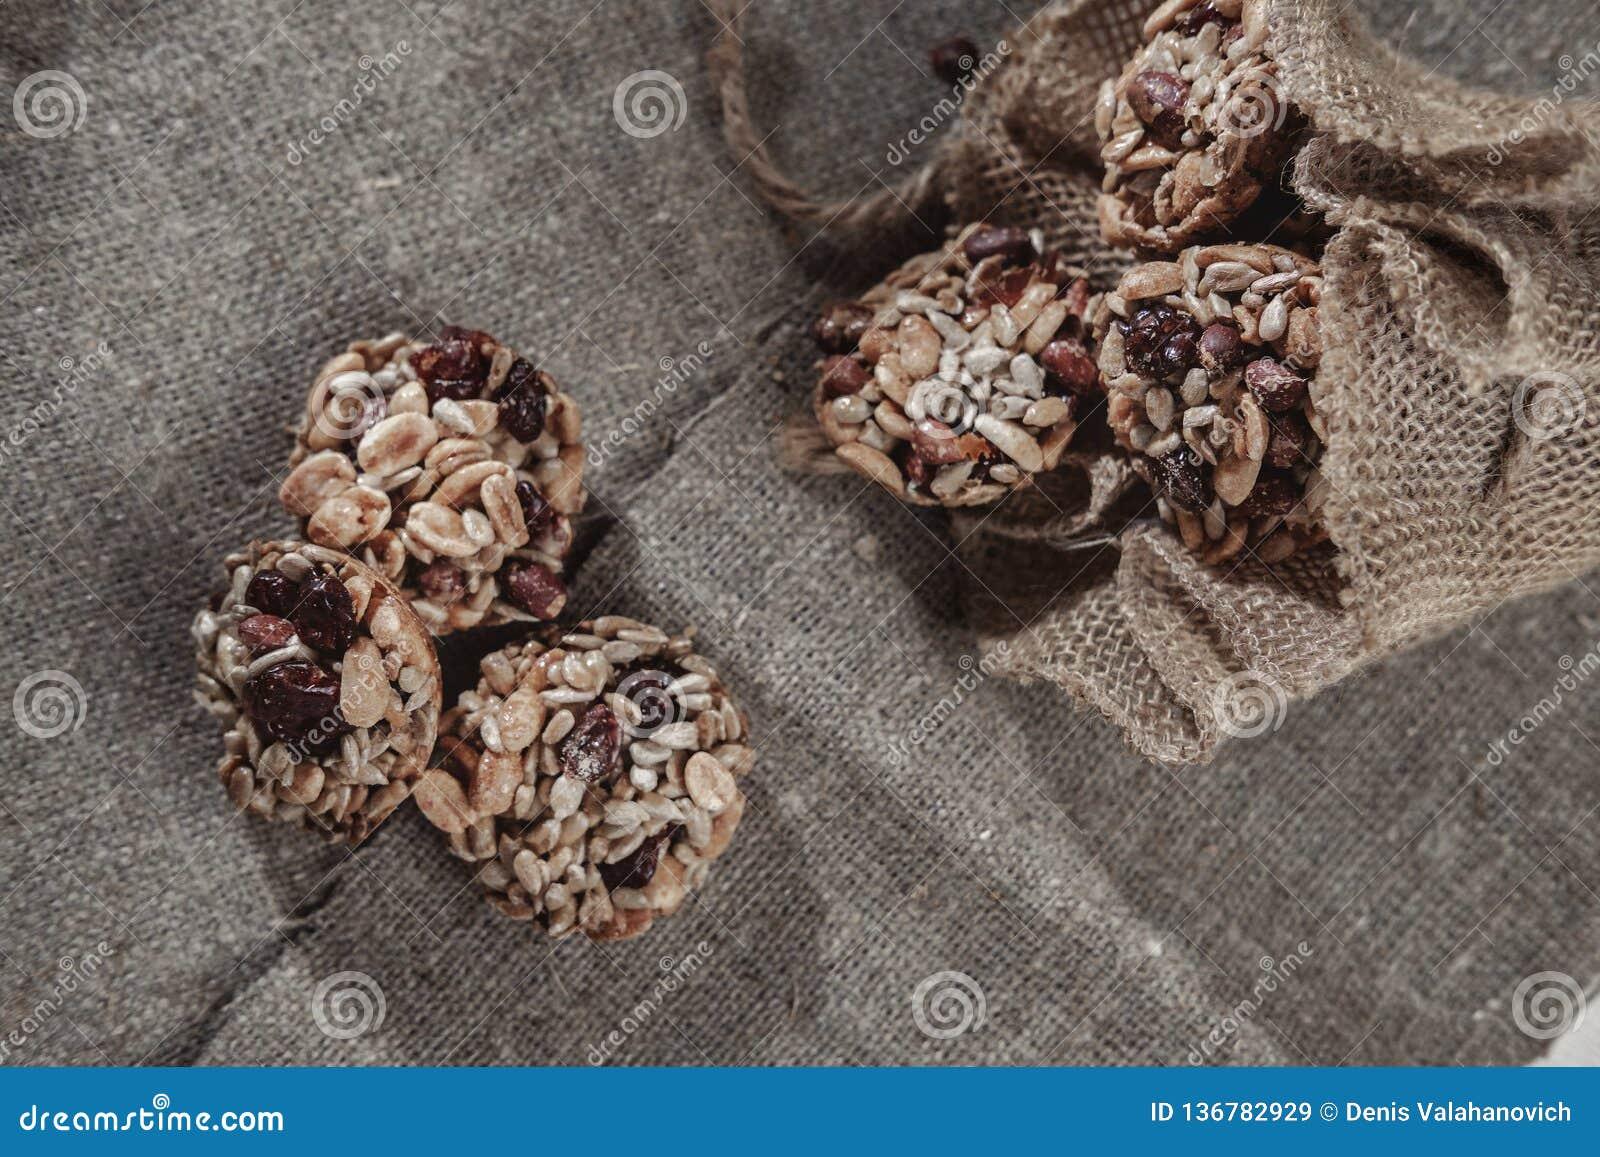 Бары хлопьев, семена подсолнуха, хрупкое арахиса